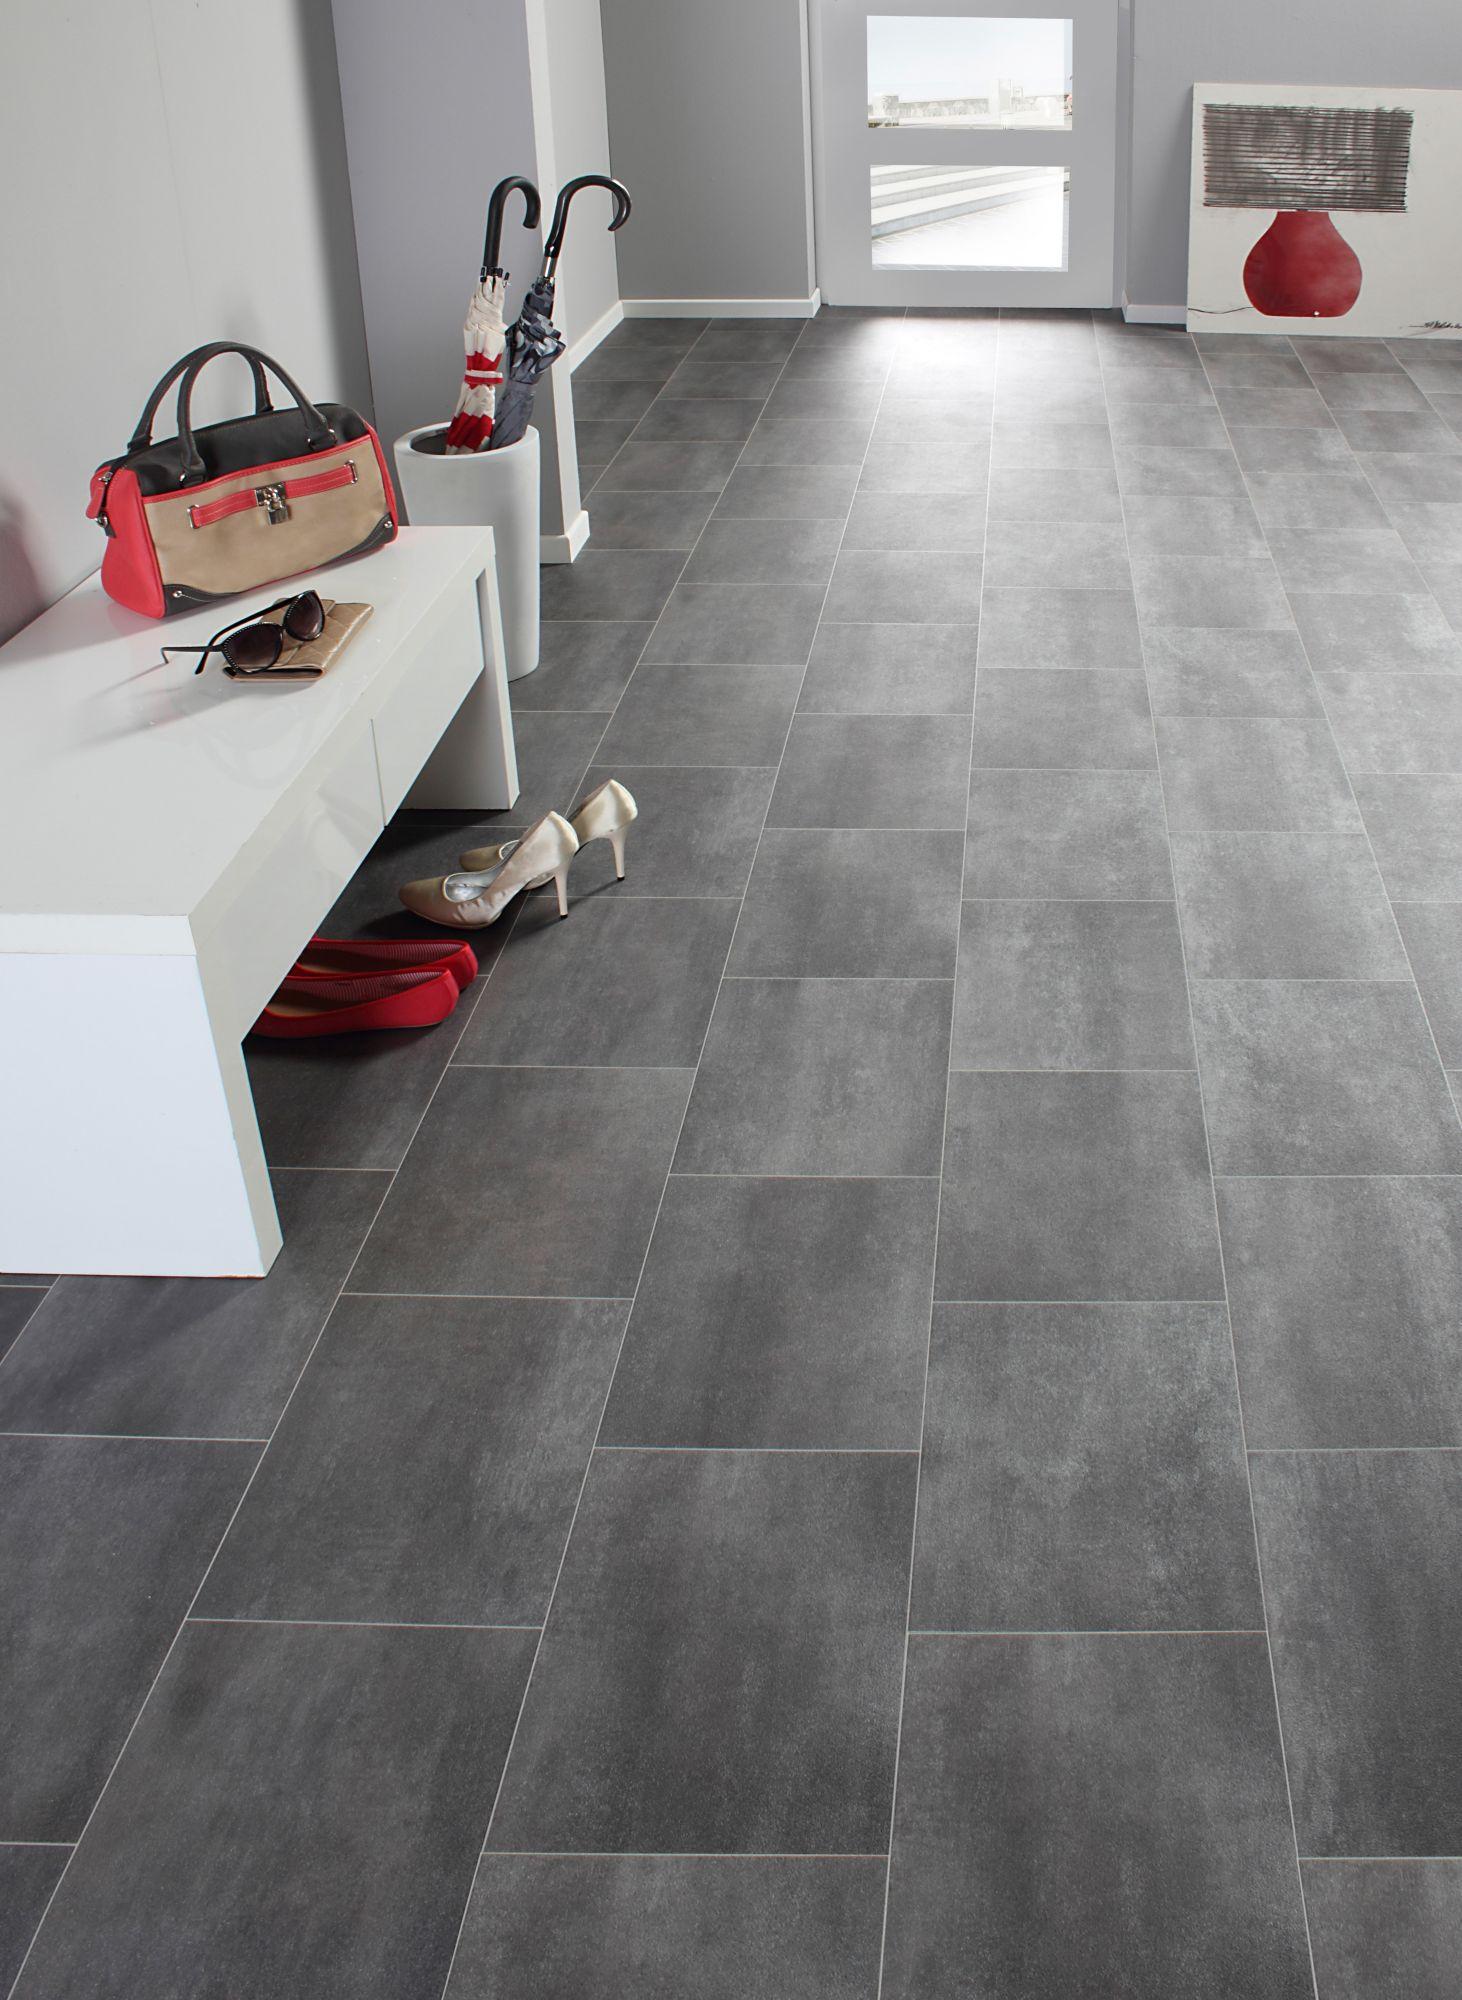 pvc boden strong fliese braun grau festma 300x400 cm schwab versand vinylboden. Black Bedroom Furniture Sets. Home Design Ideas